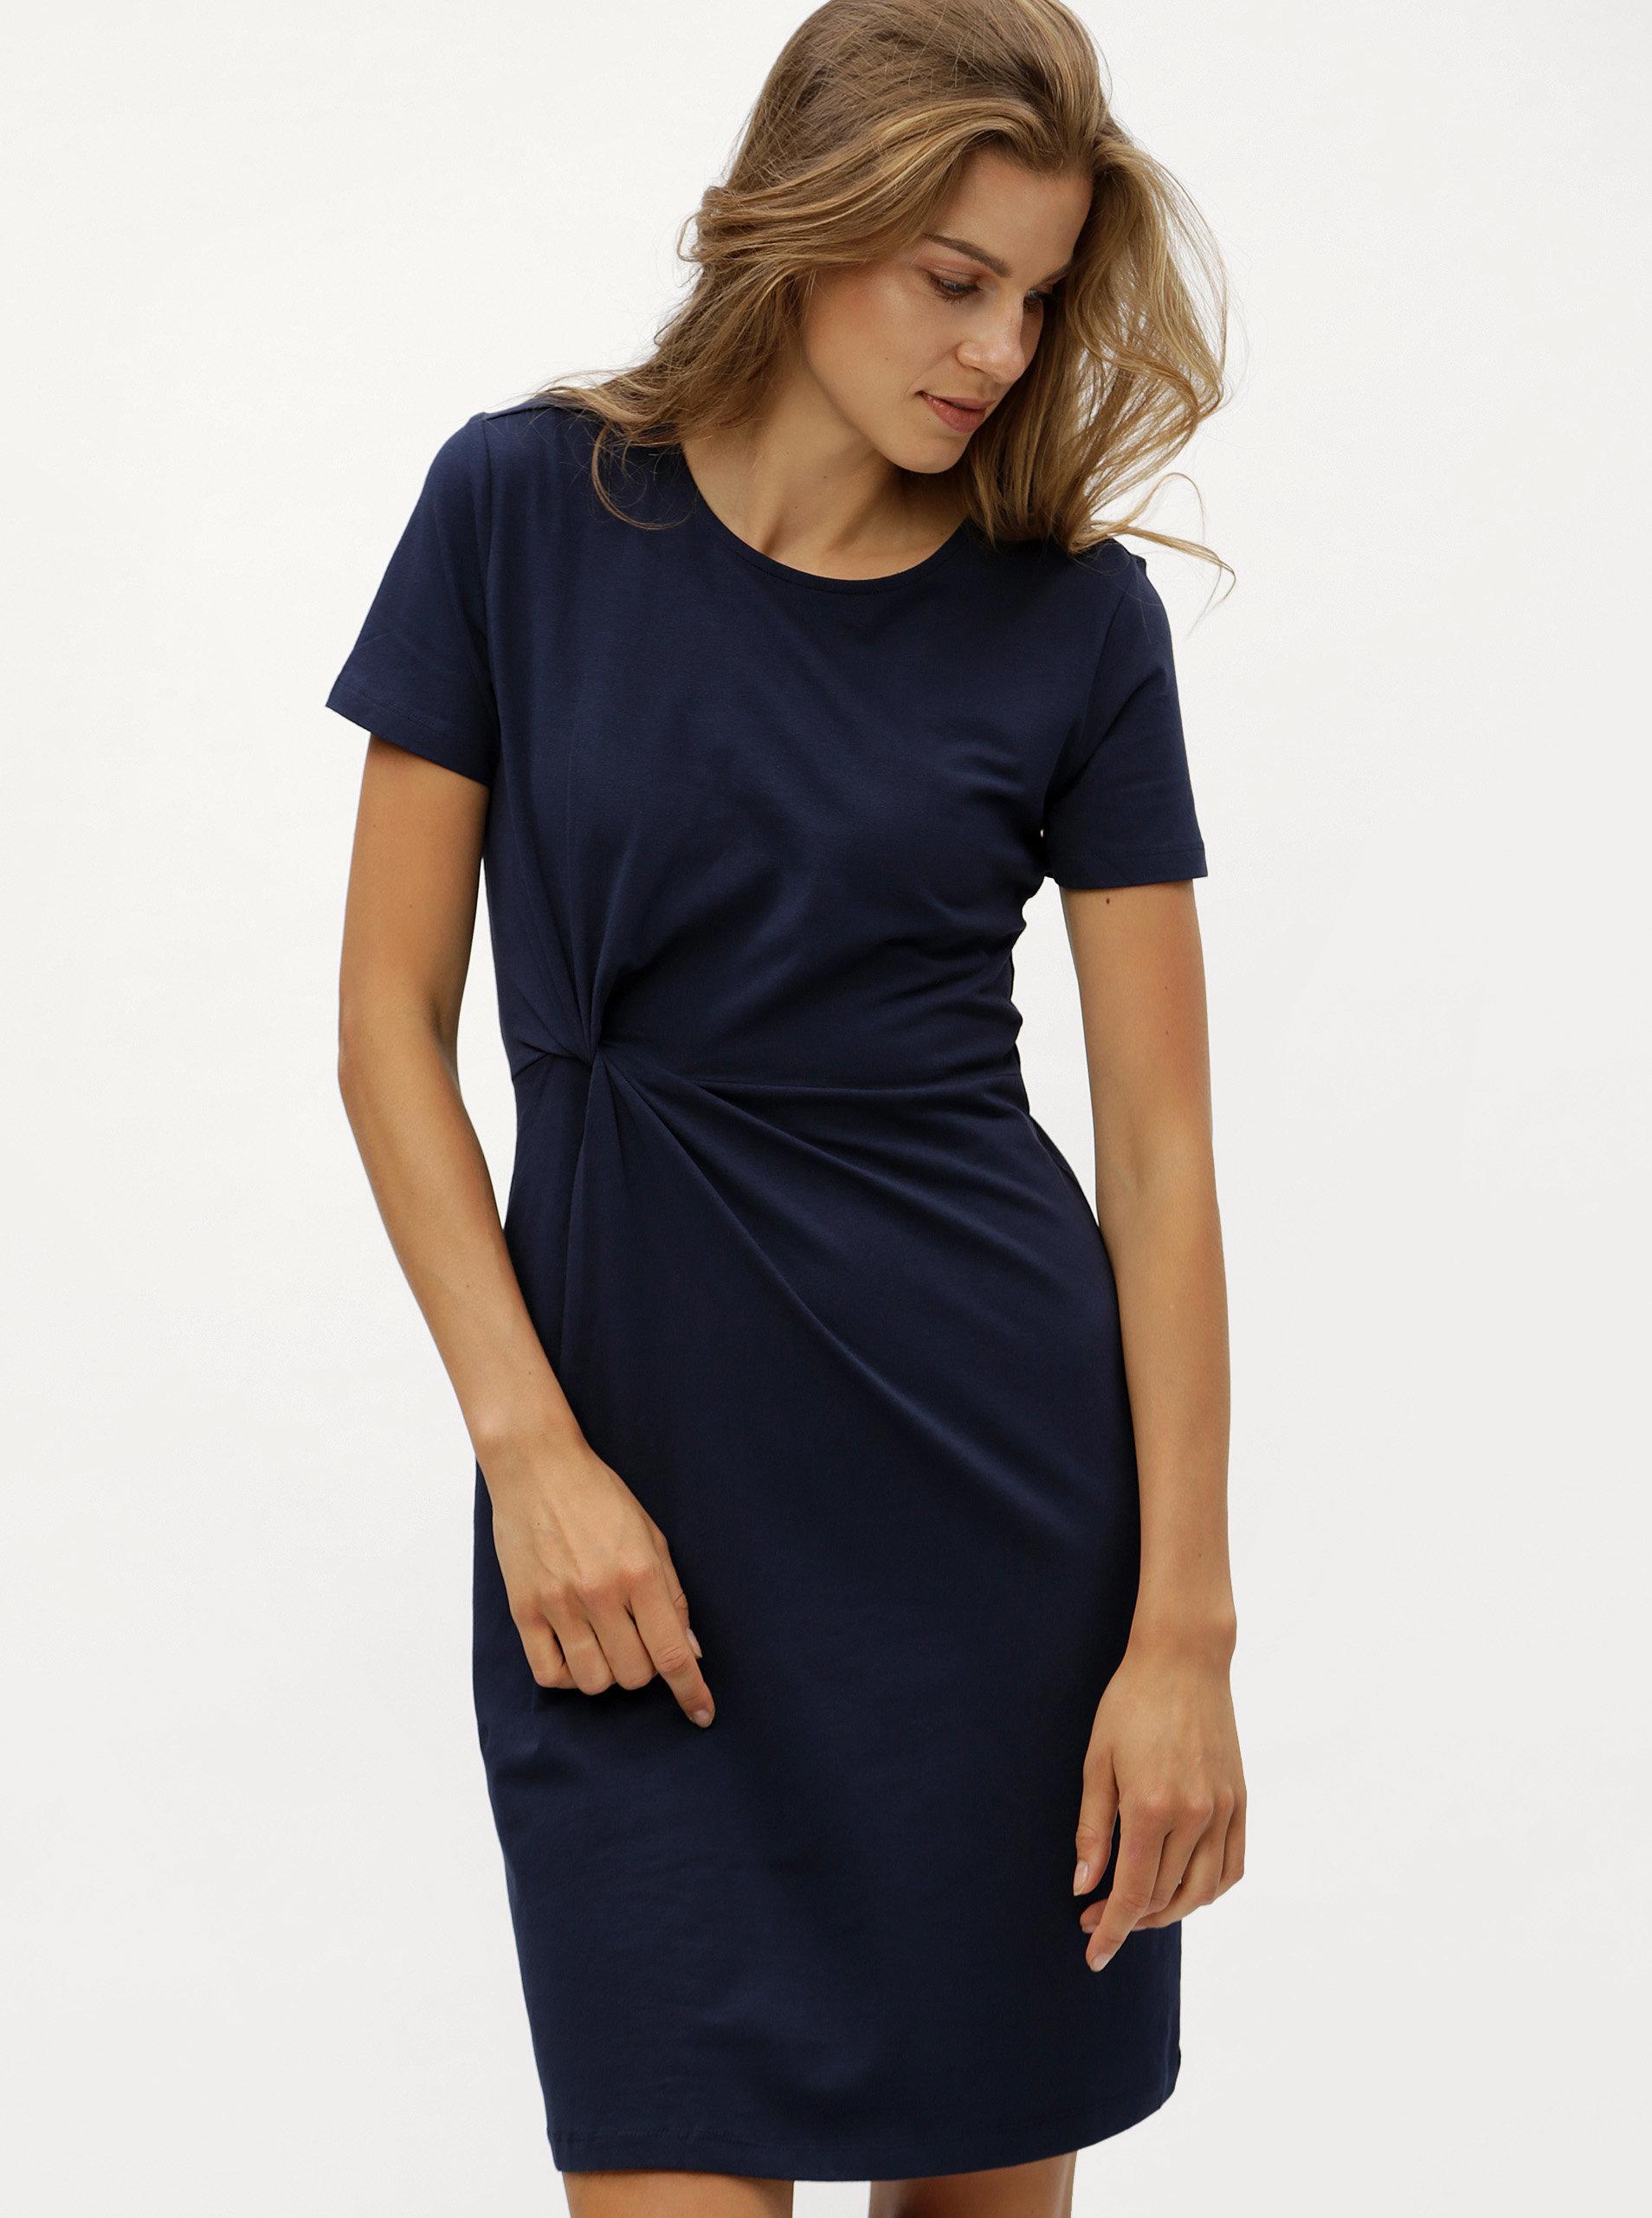 bdbfb281b119 Tmavomodré šaty s uzlom Jacqueline de Yong Domino ...